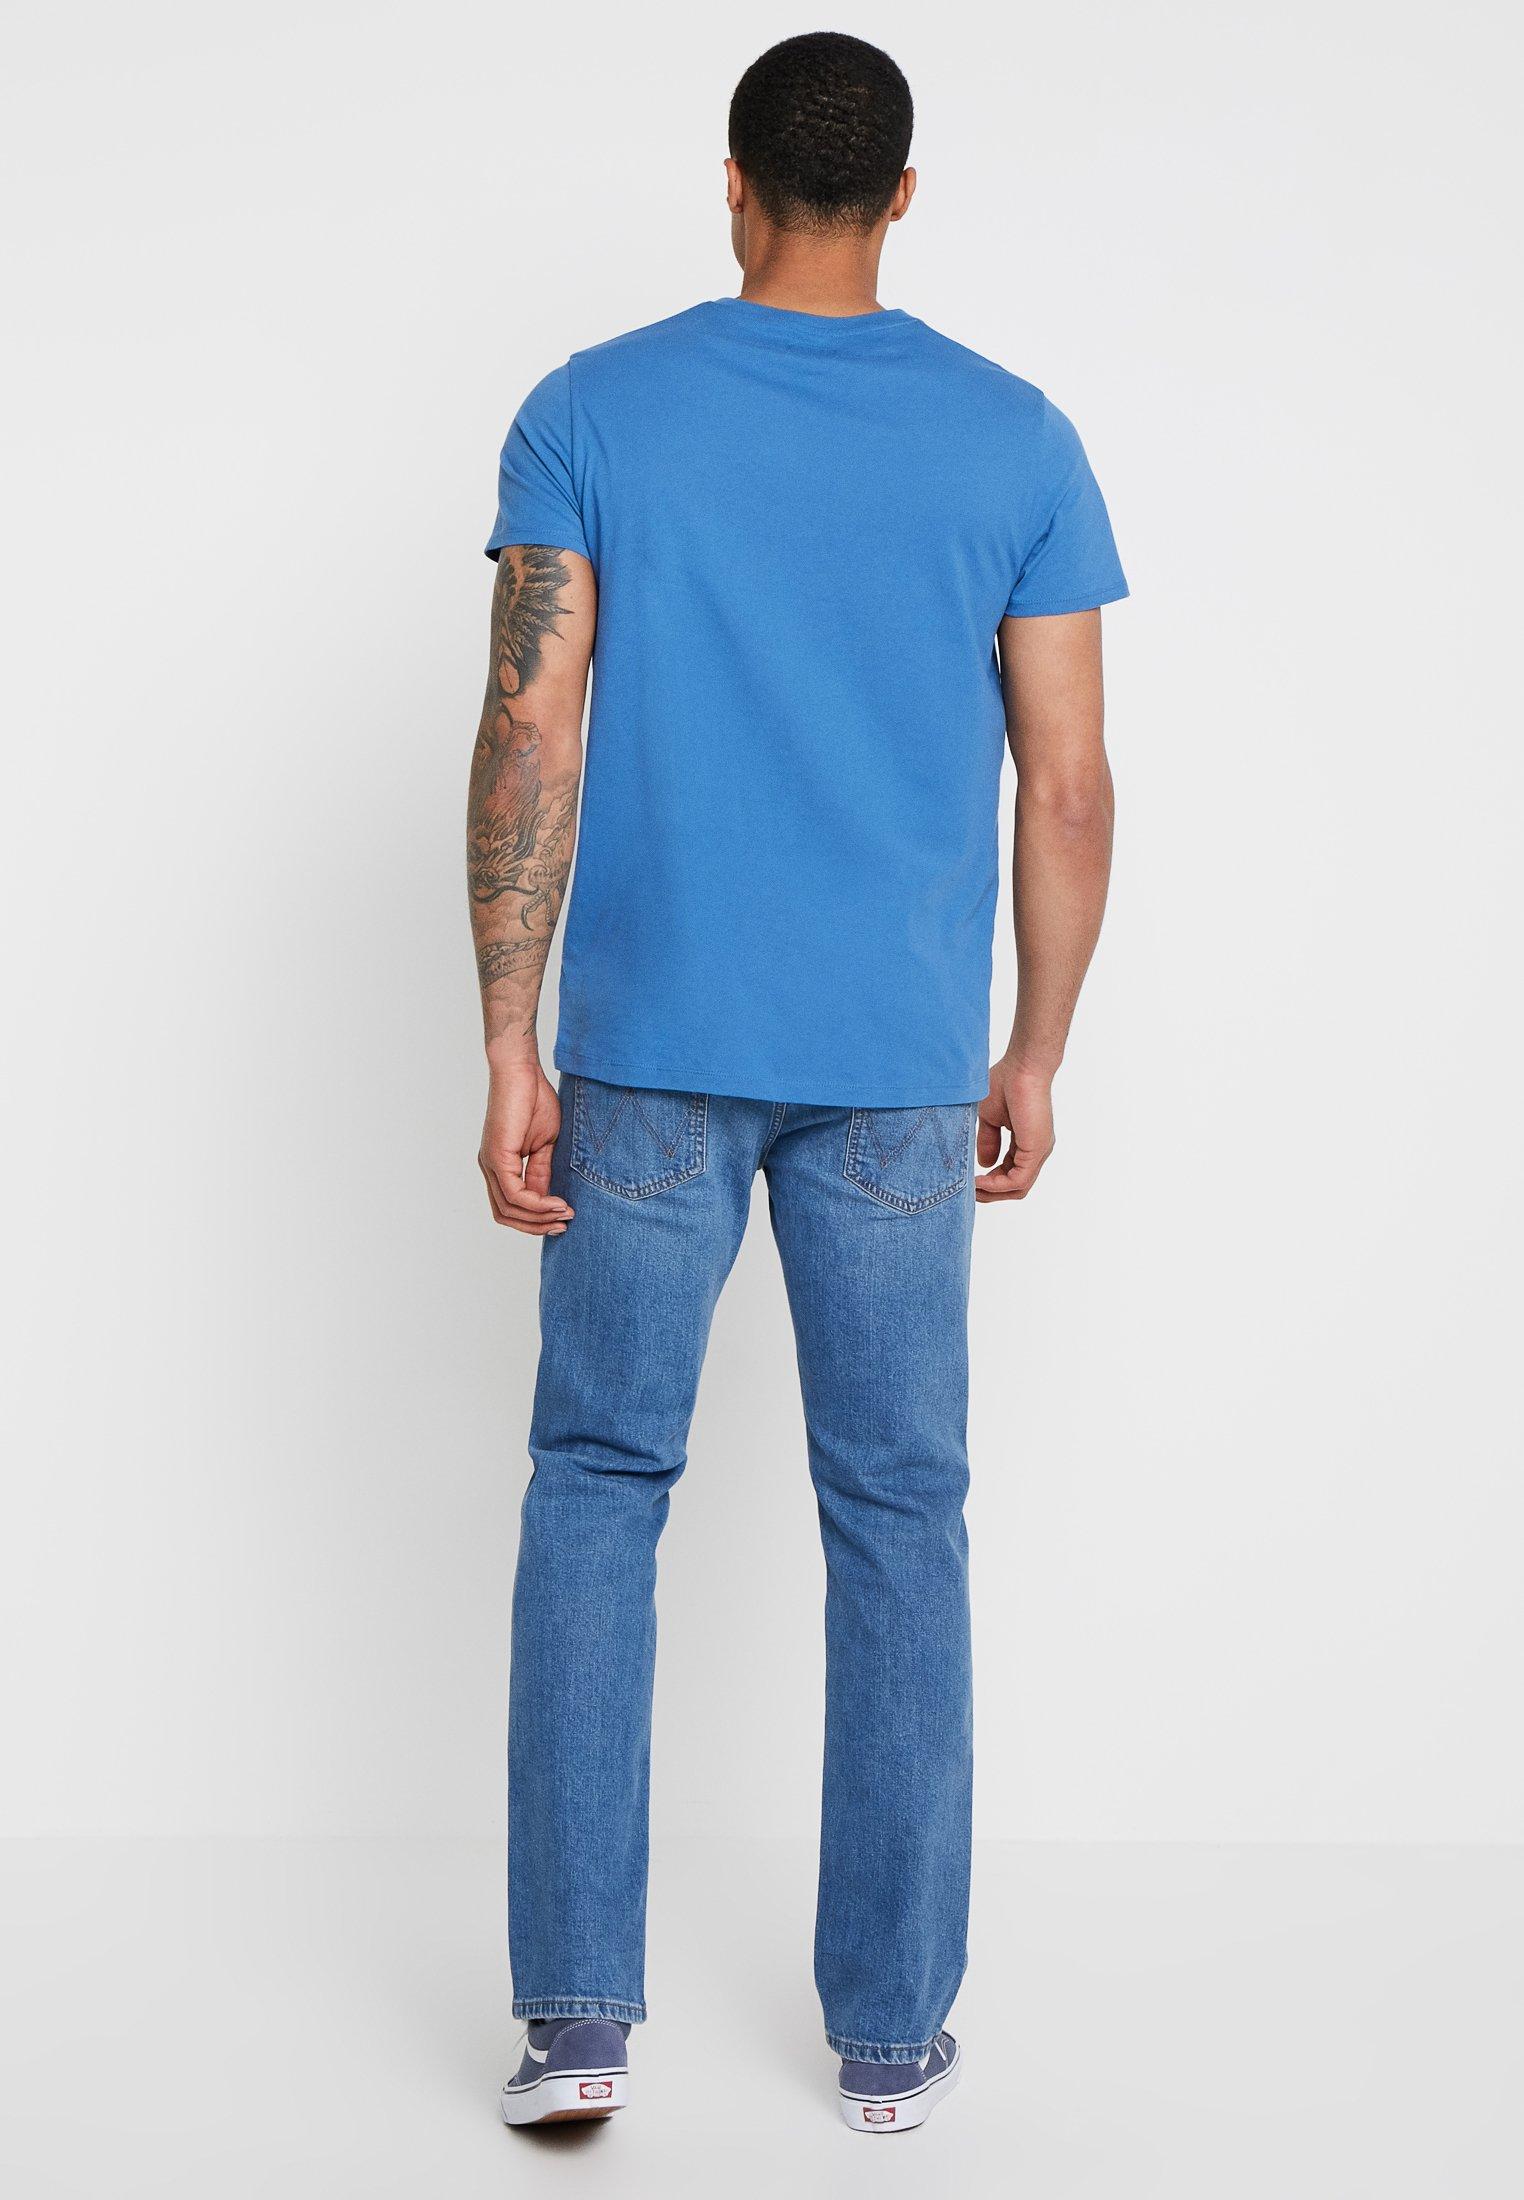 ArizonaJean Droit Wrangler ArizonaJean Fuse Wrangler Blue mwn8N0